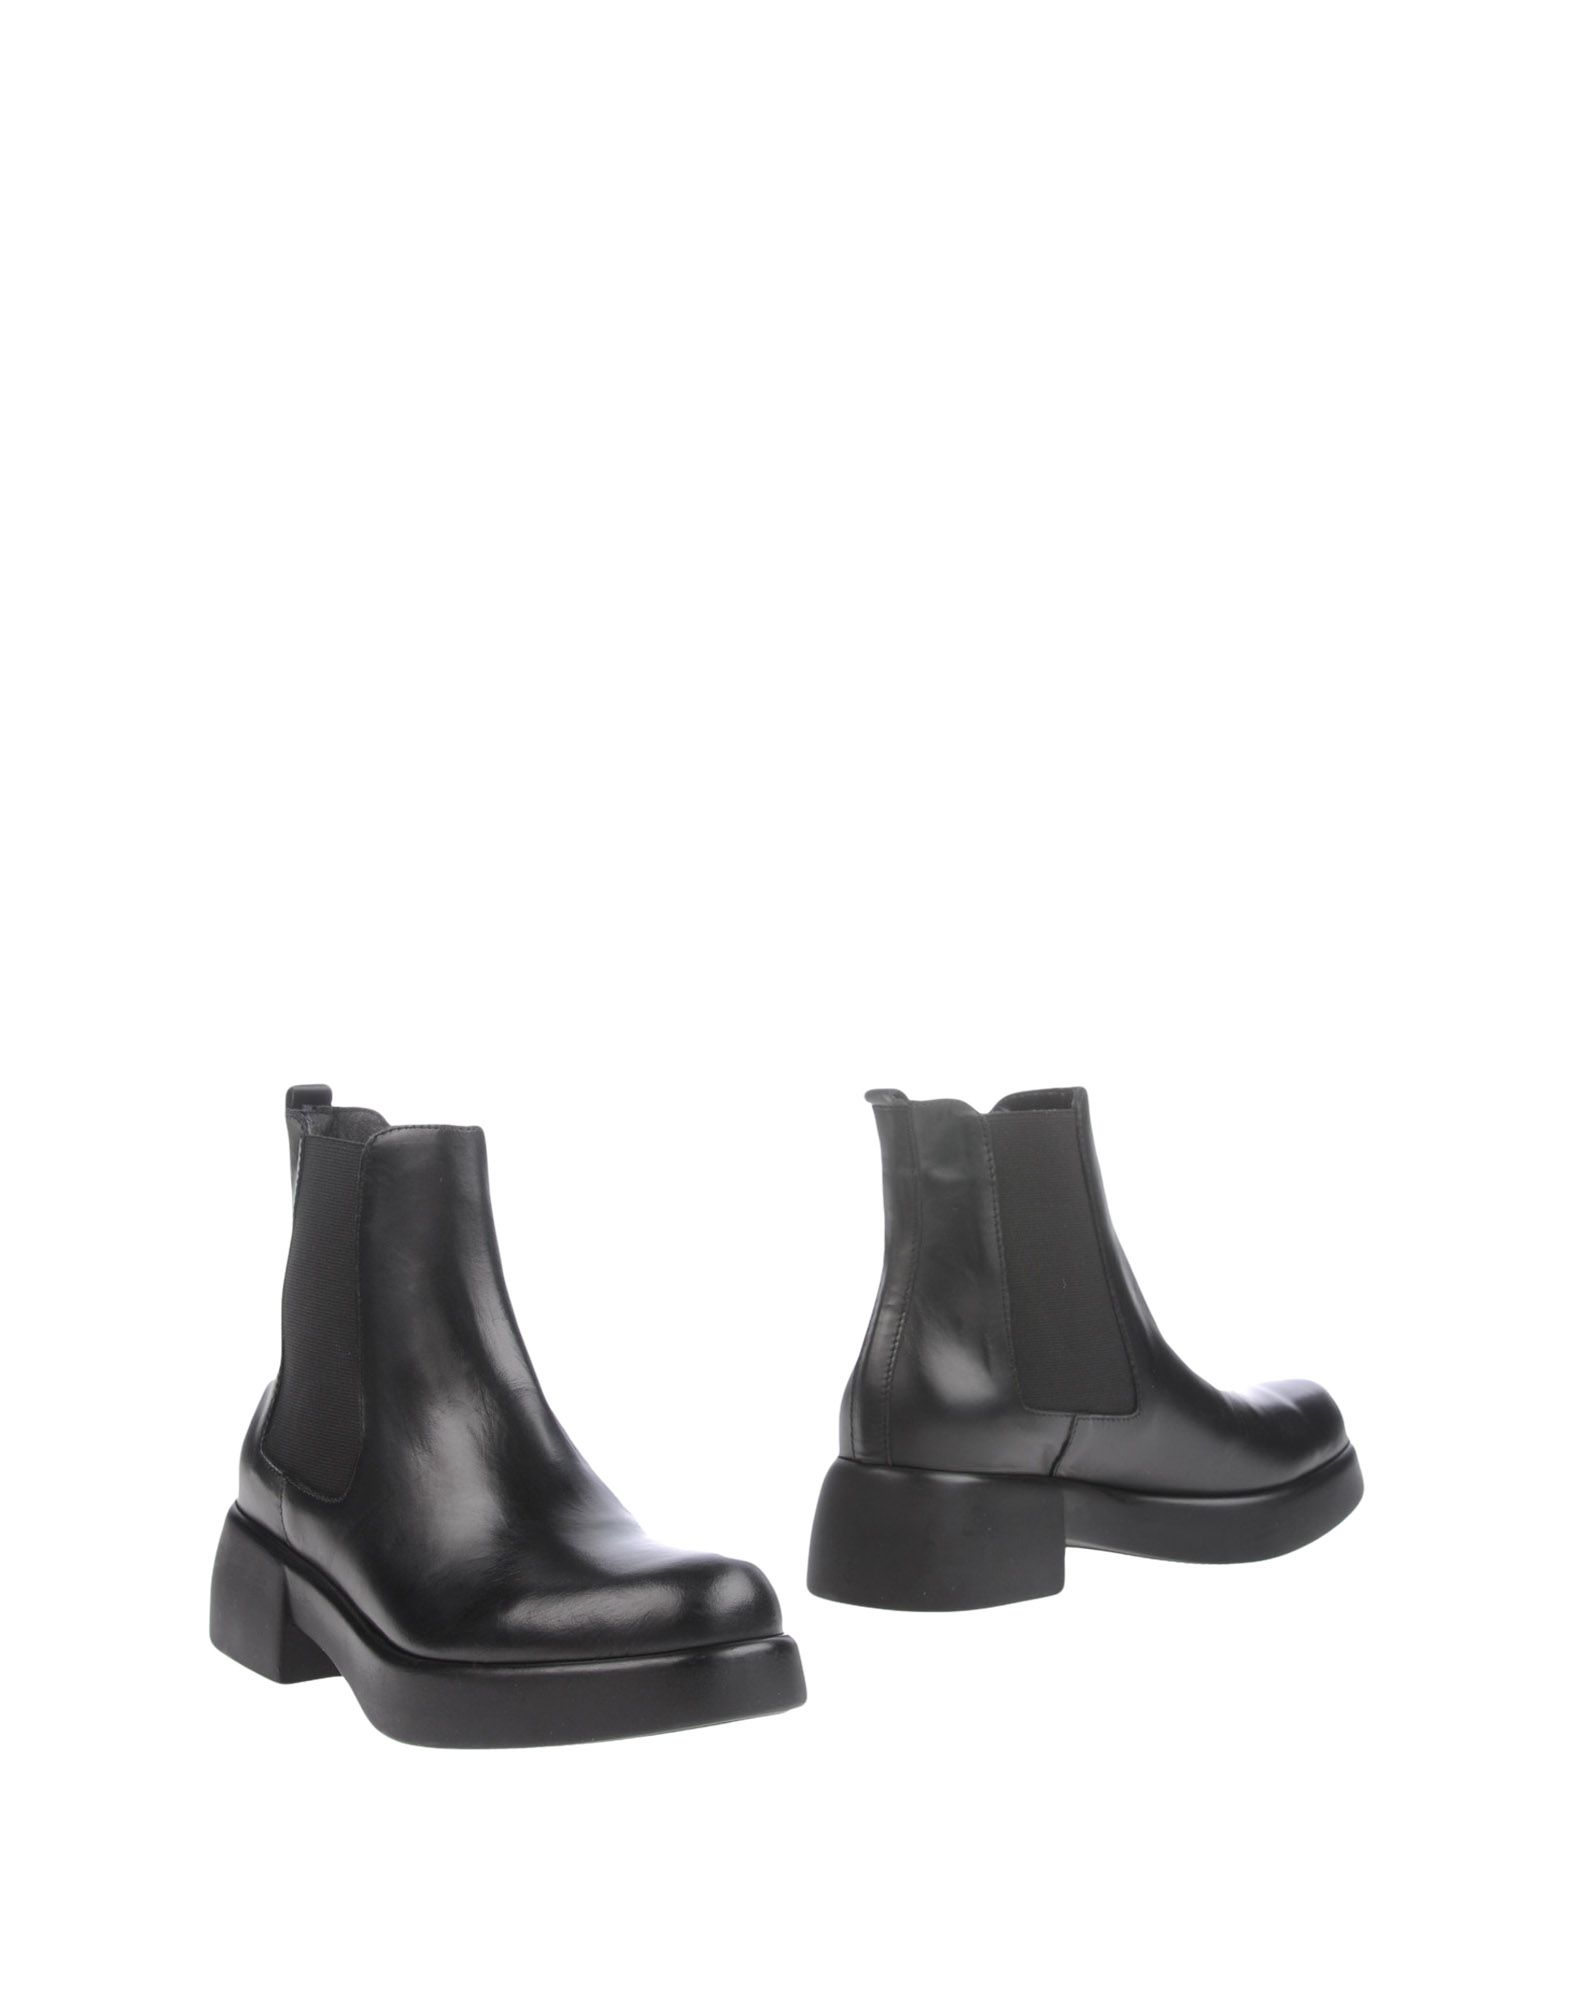 GIOSEPPO Полусапоги и высокие ботинки kudeta полусапоги и высокие ботинки